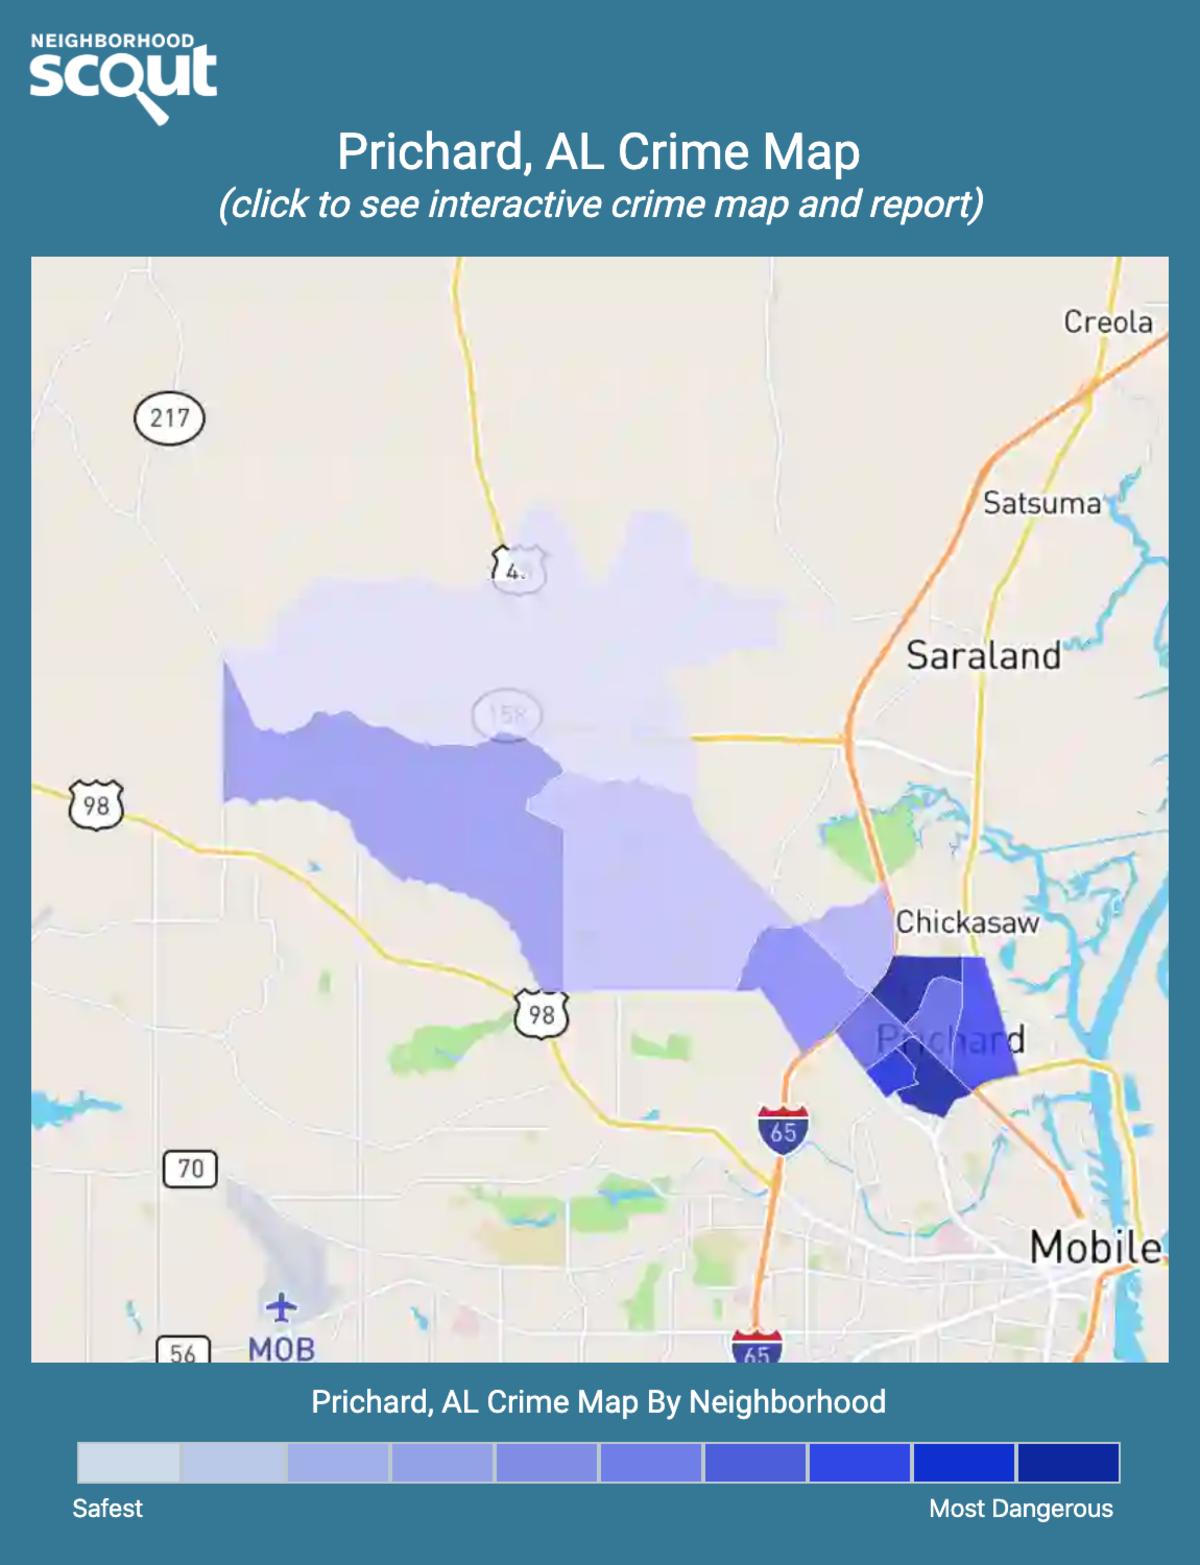 Prichard Alabama: Prichard, AL Crime Rates And Statistics